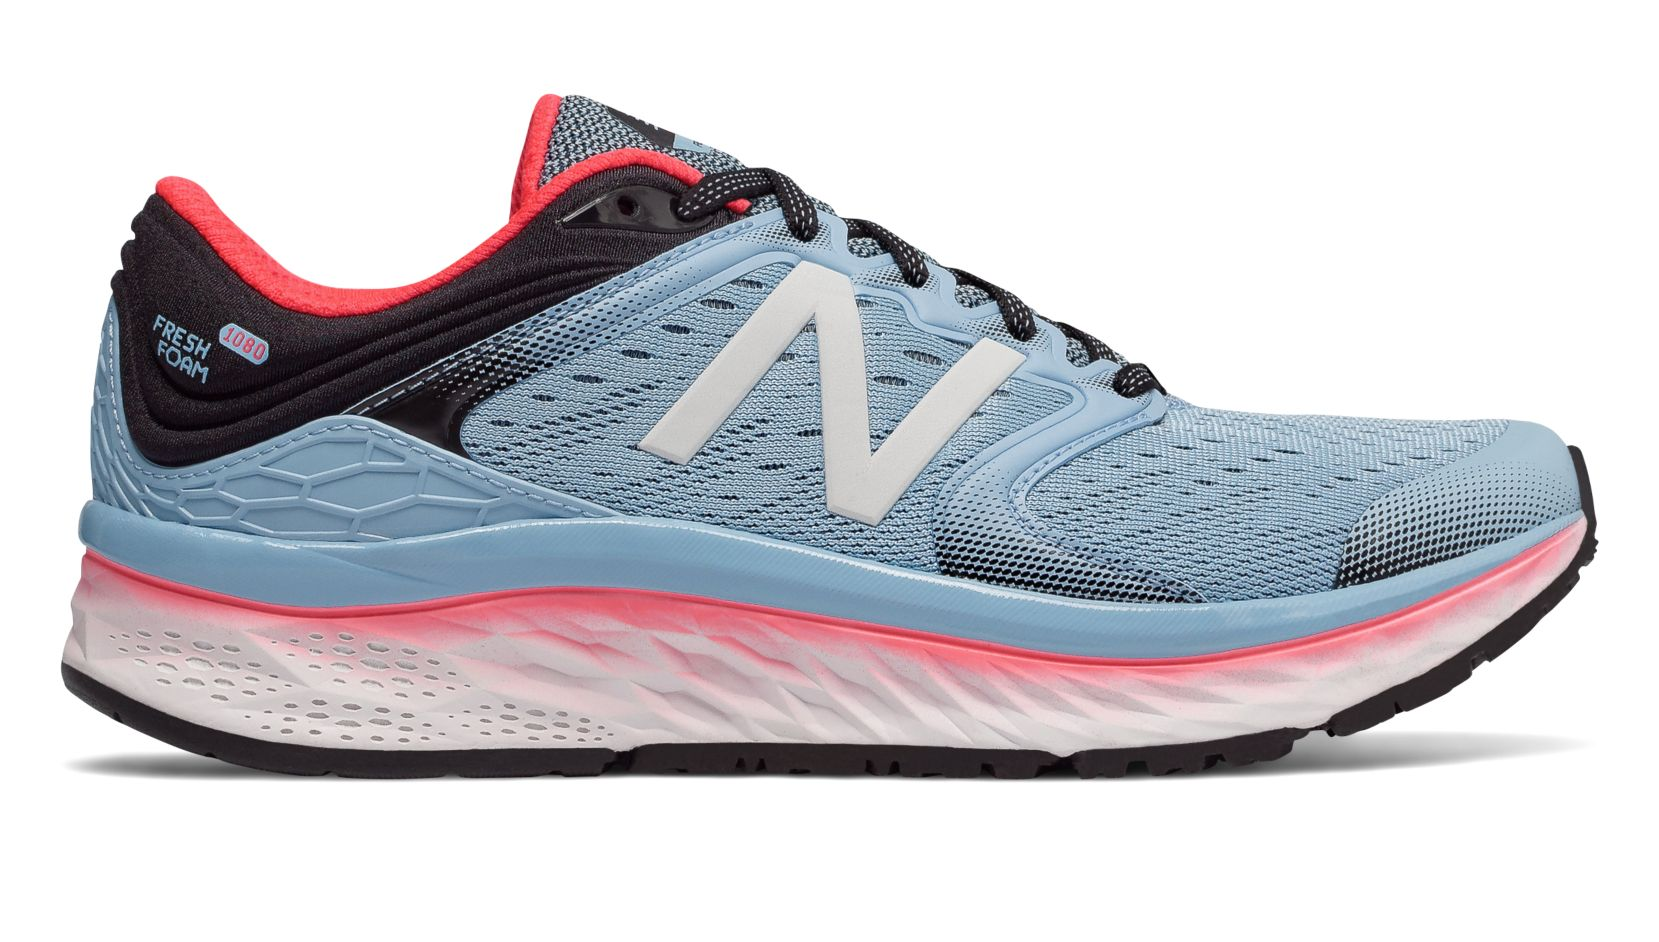 best womens running shoes - new balance 1080V8